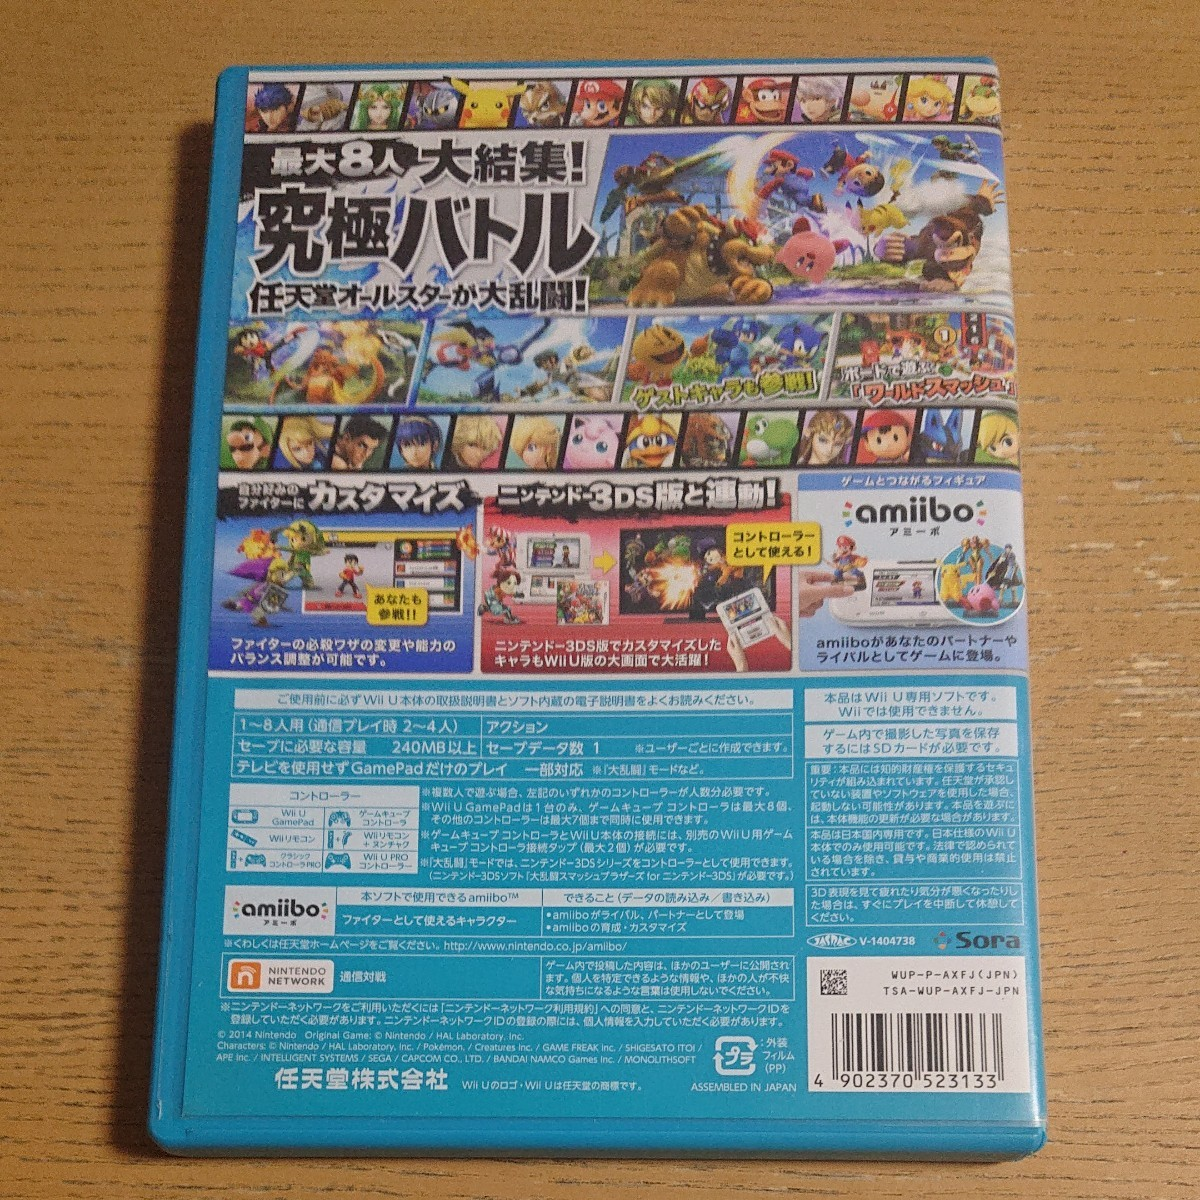 WiiU ソフト 大乱闘スマッシュブラザーズfor Wii U  中古品